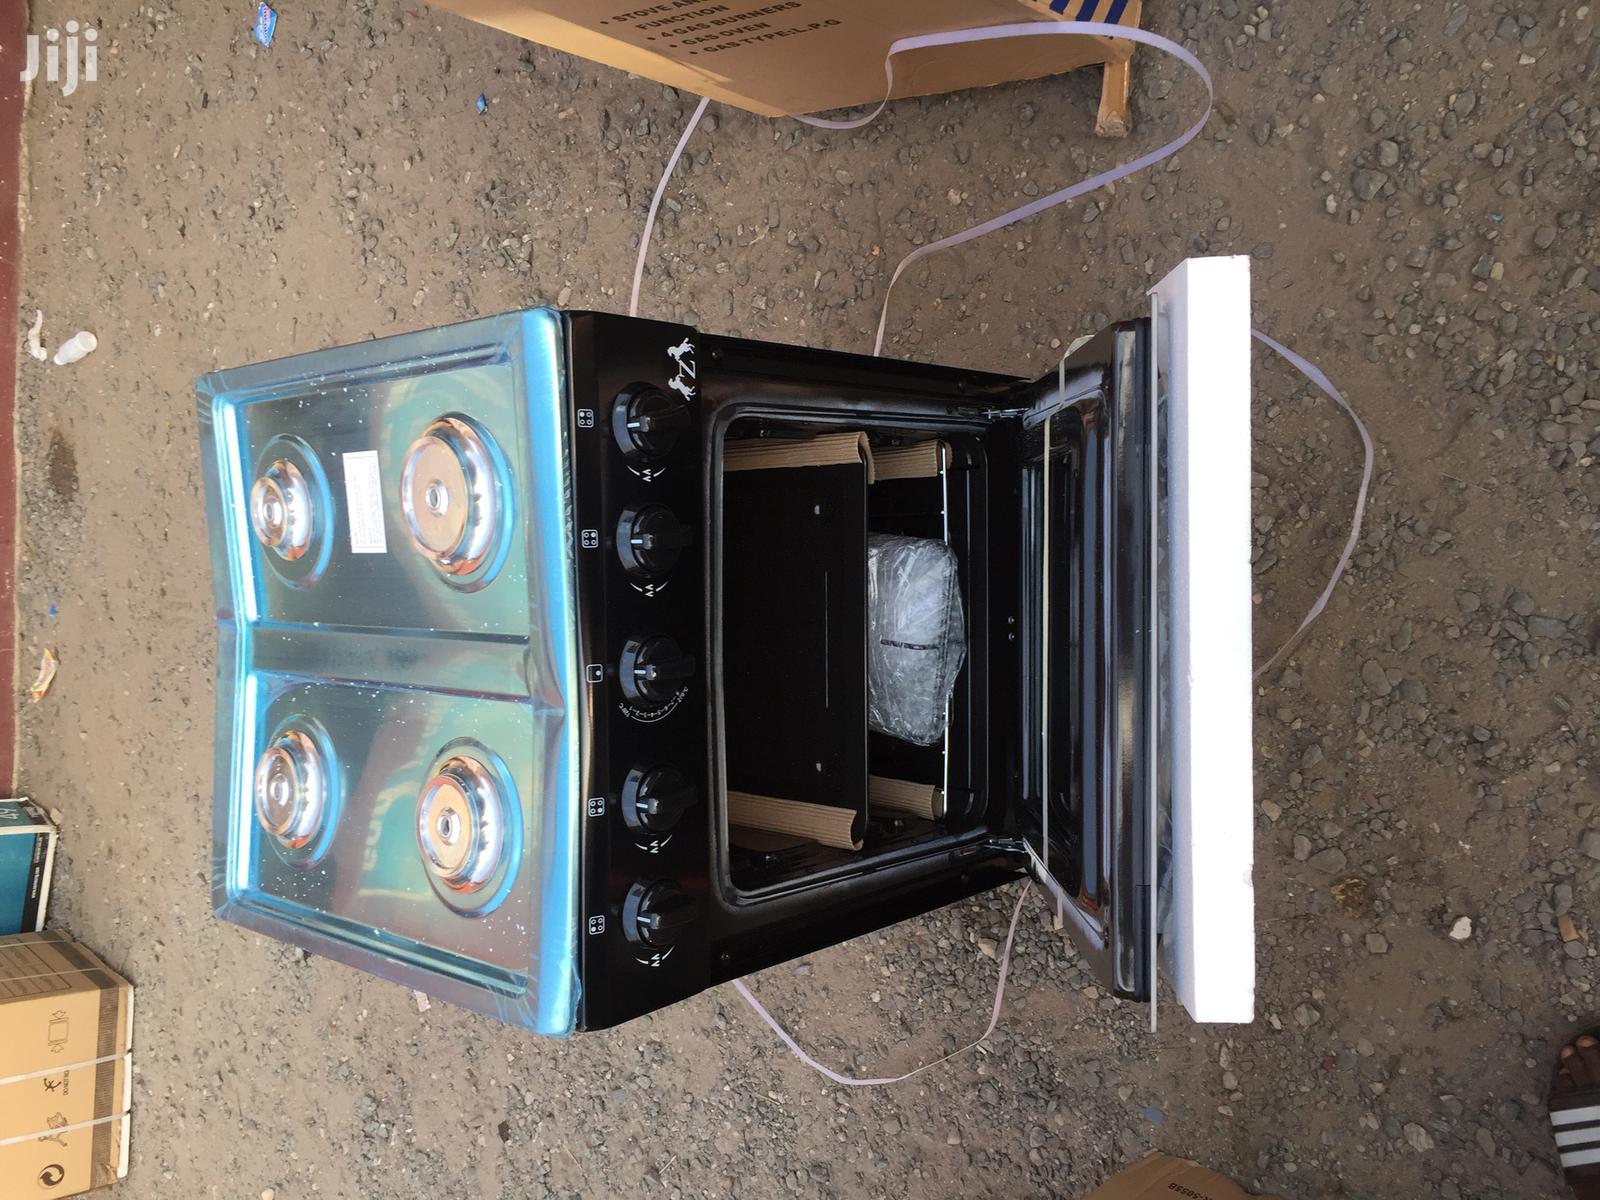 ZARA Gas Cooker 4 Burner Stove Black